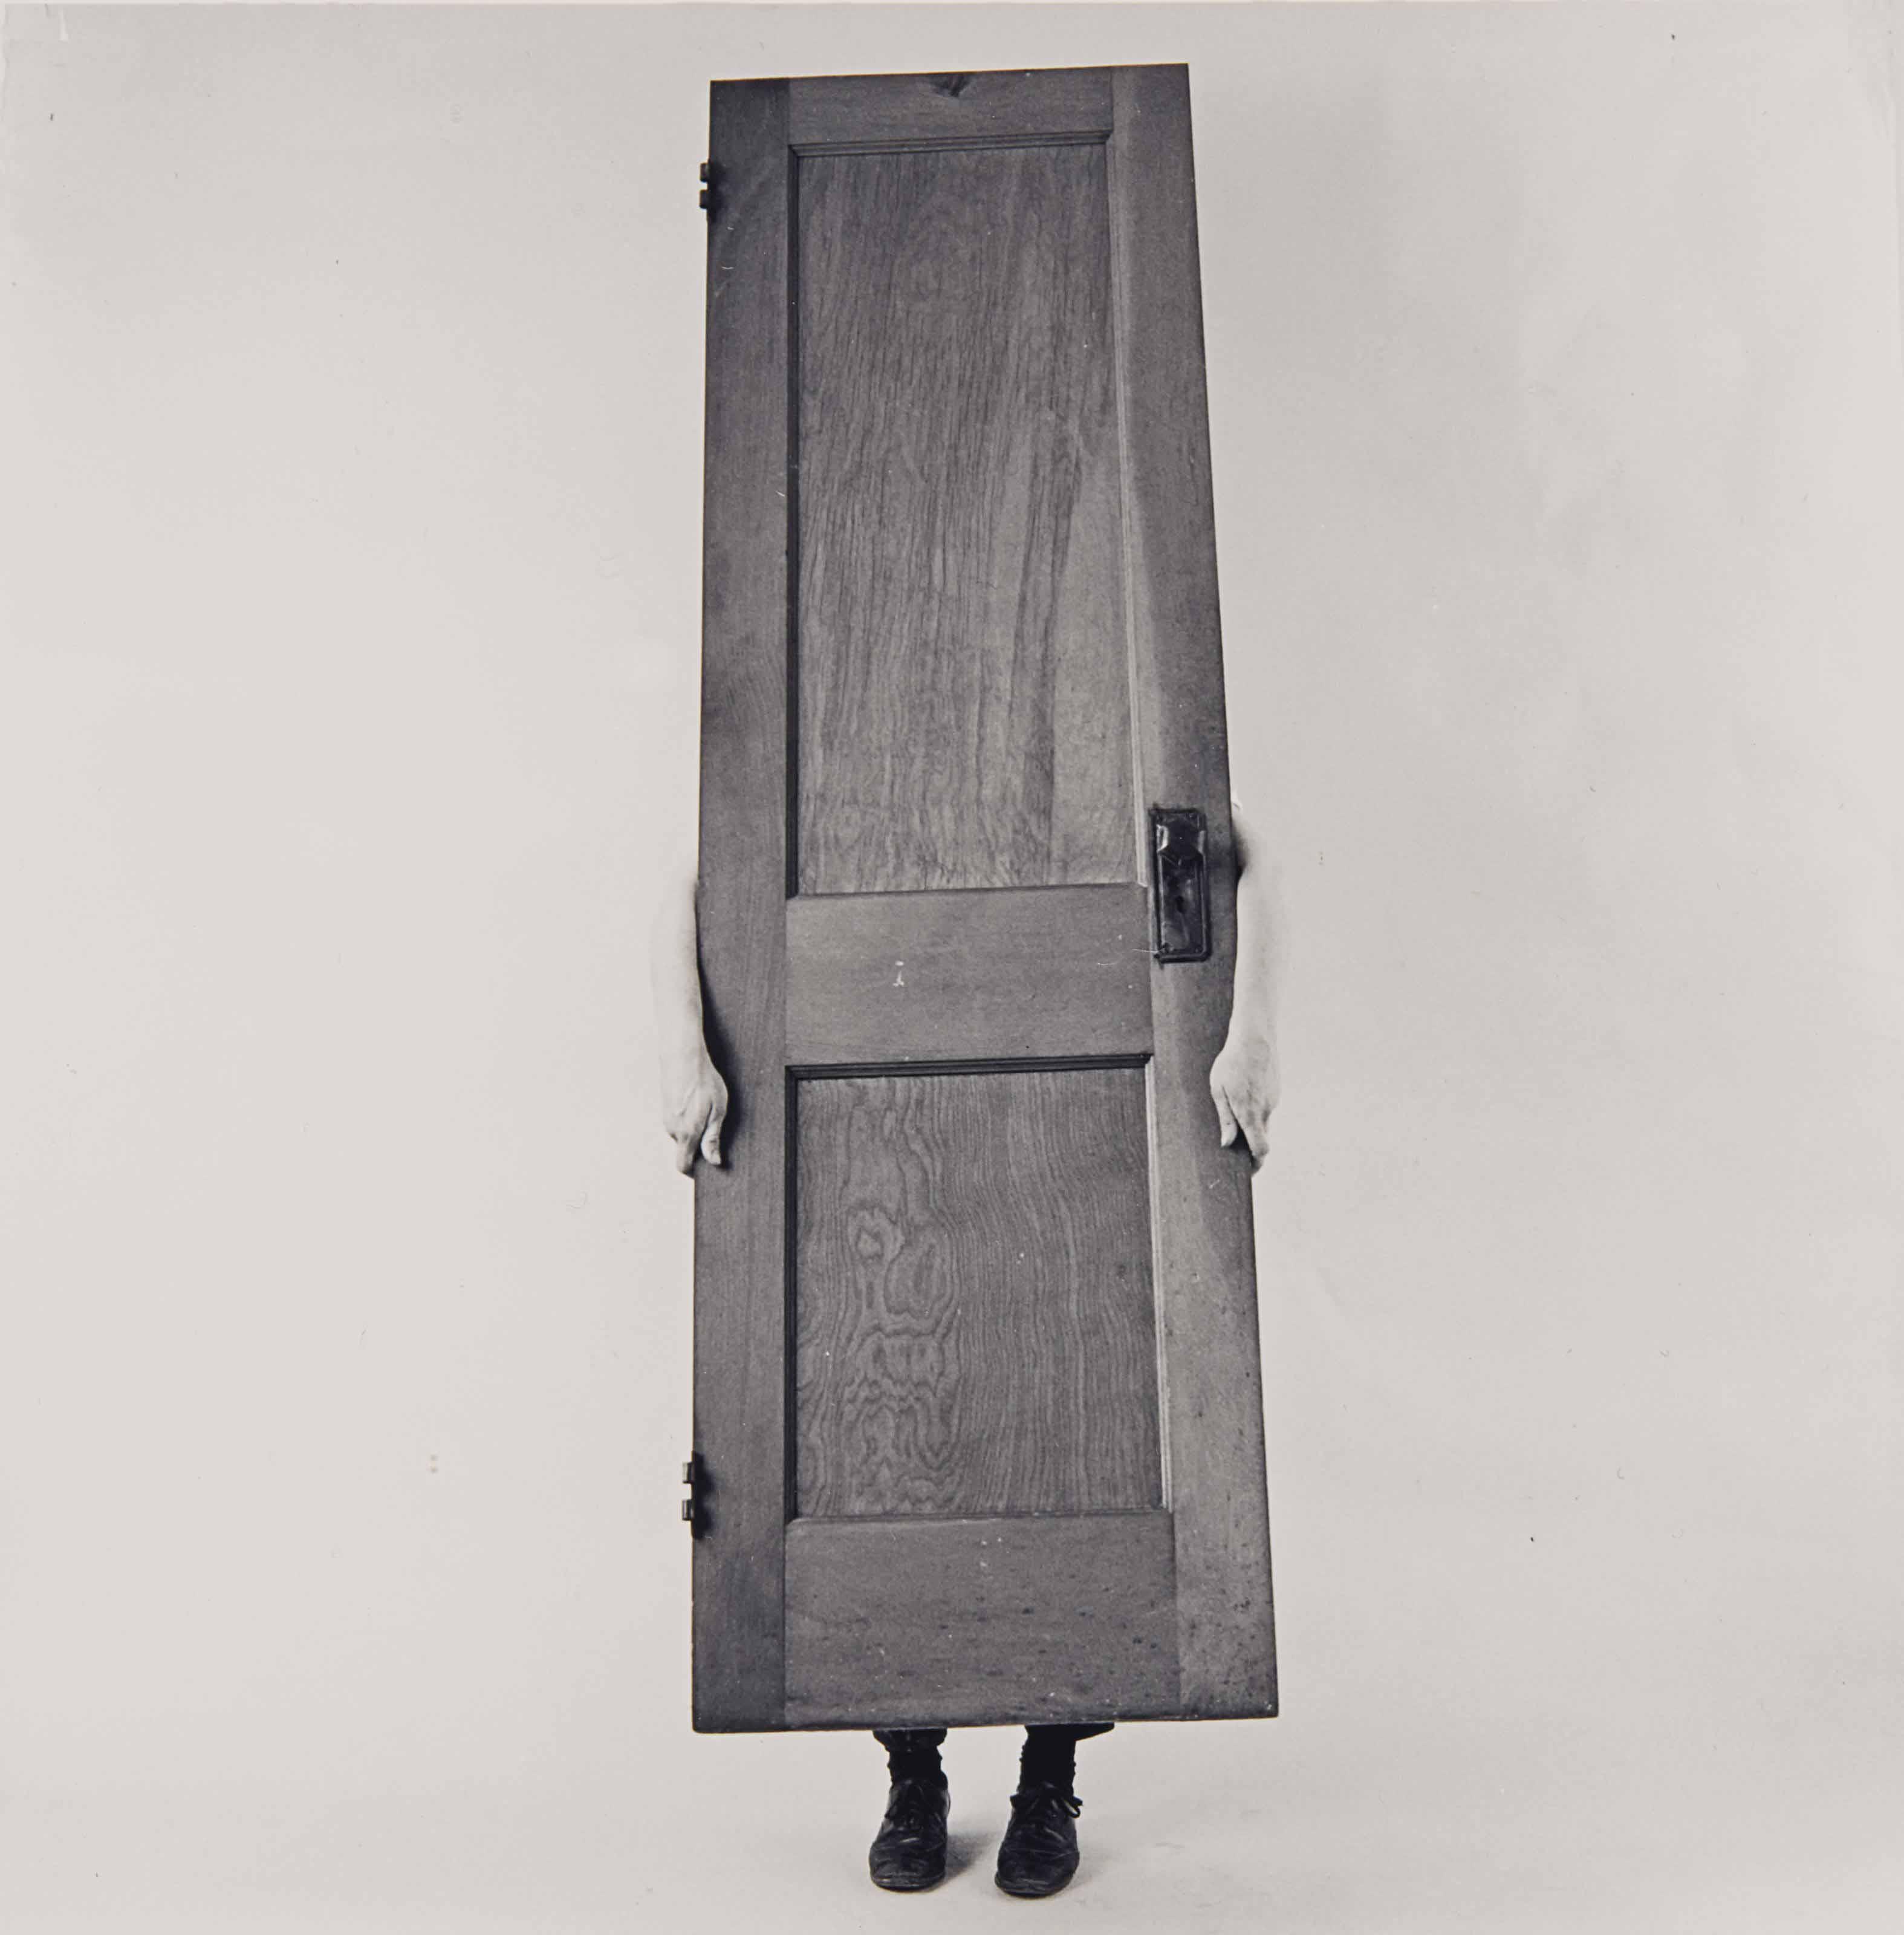 Sans titre (The Body Object Series) No. 12, 1984